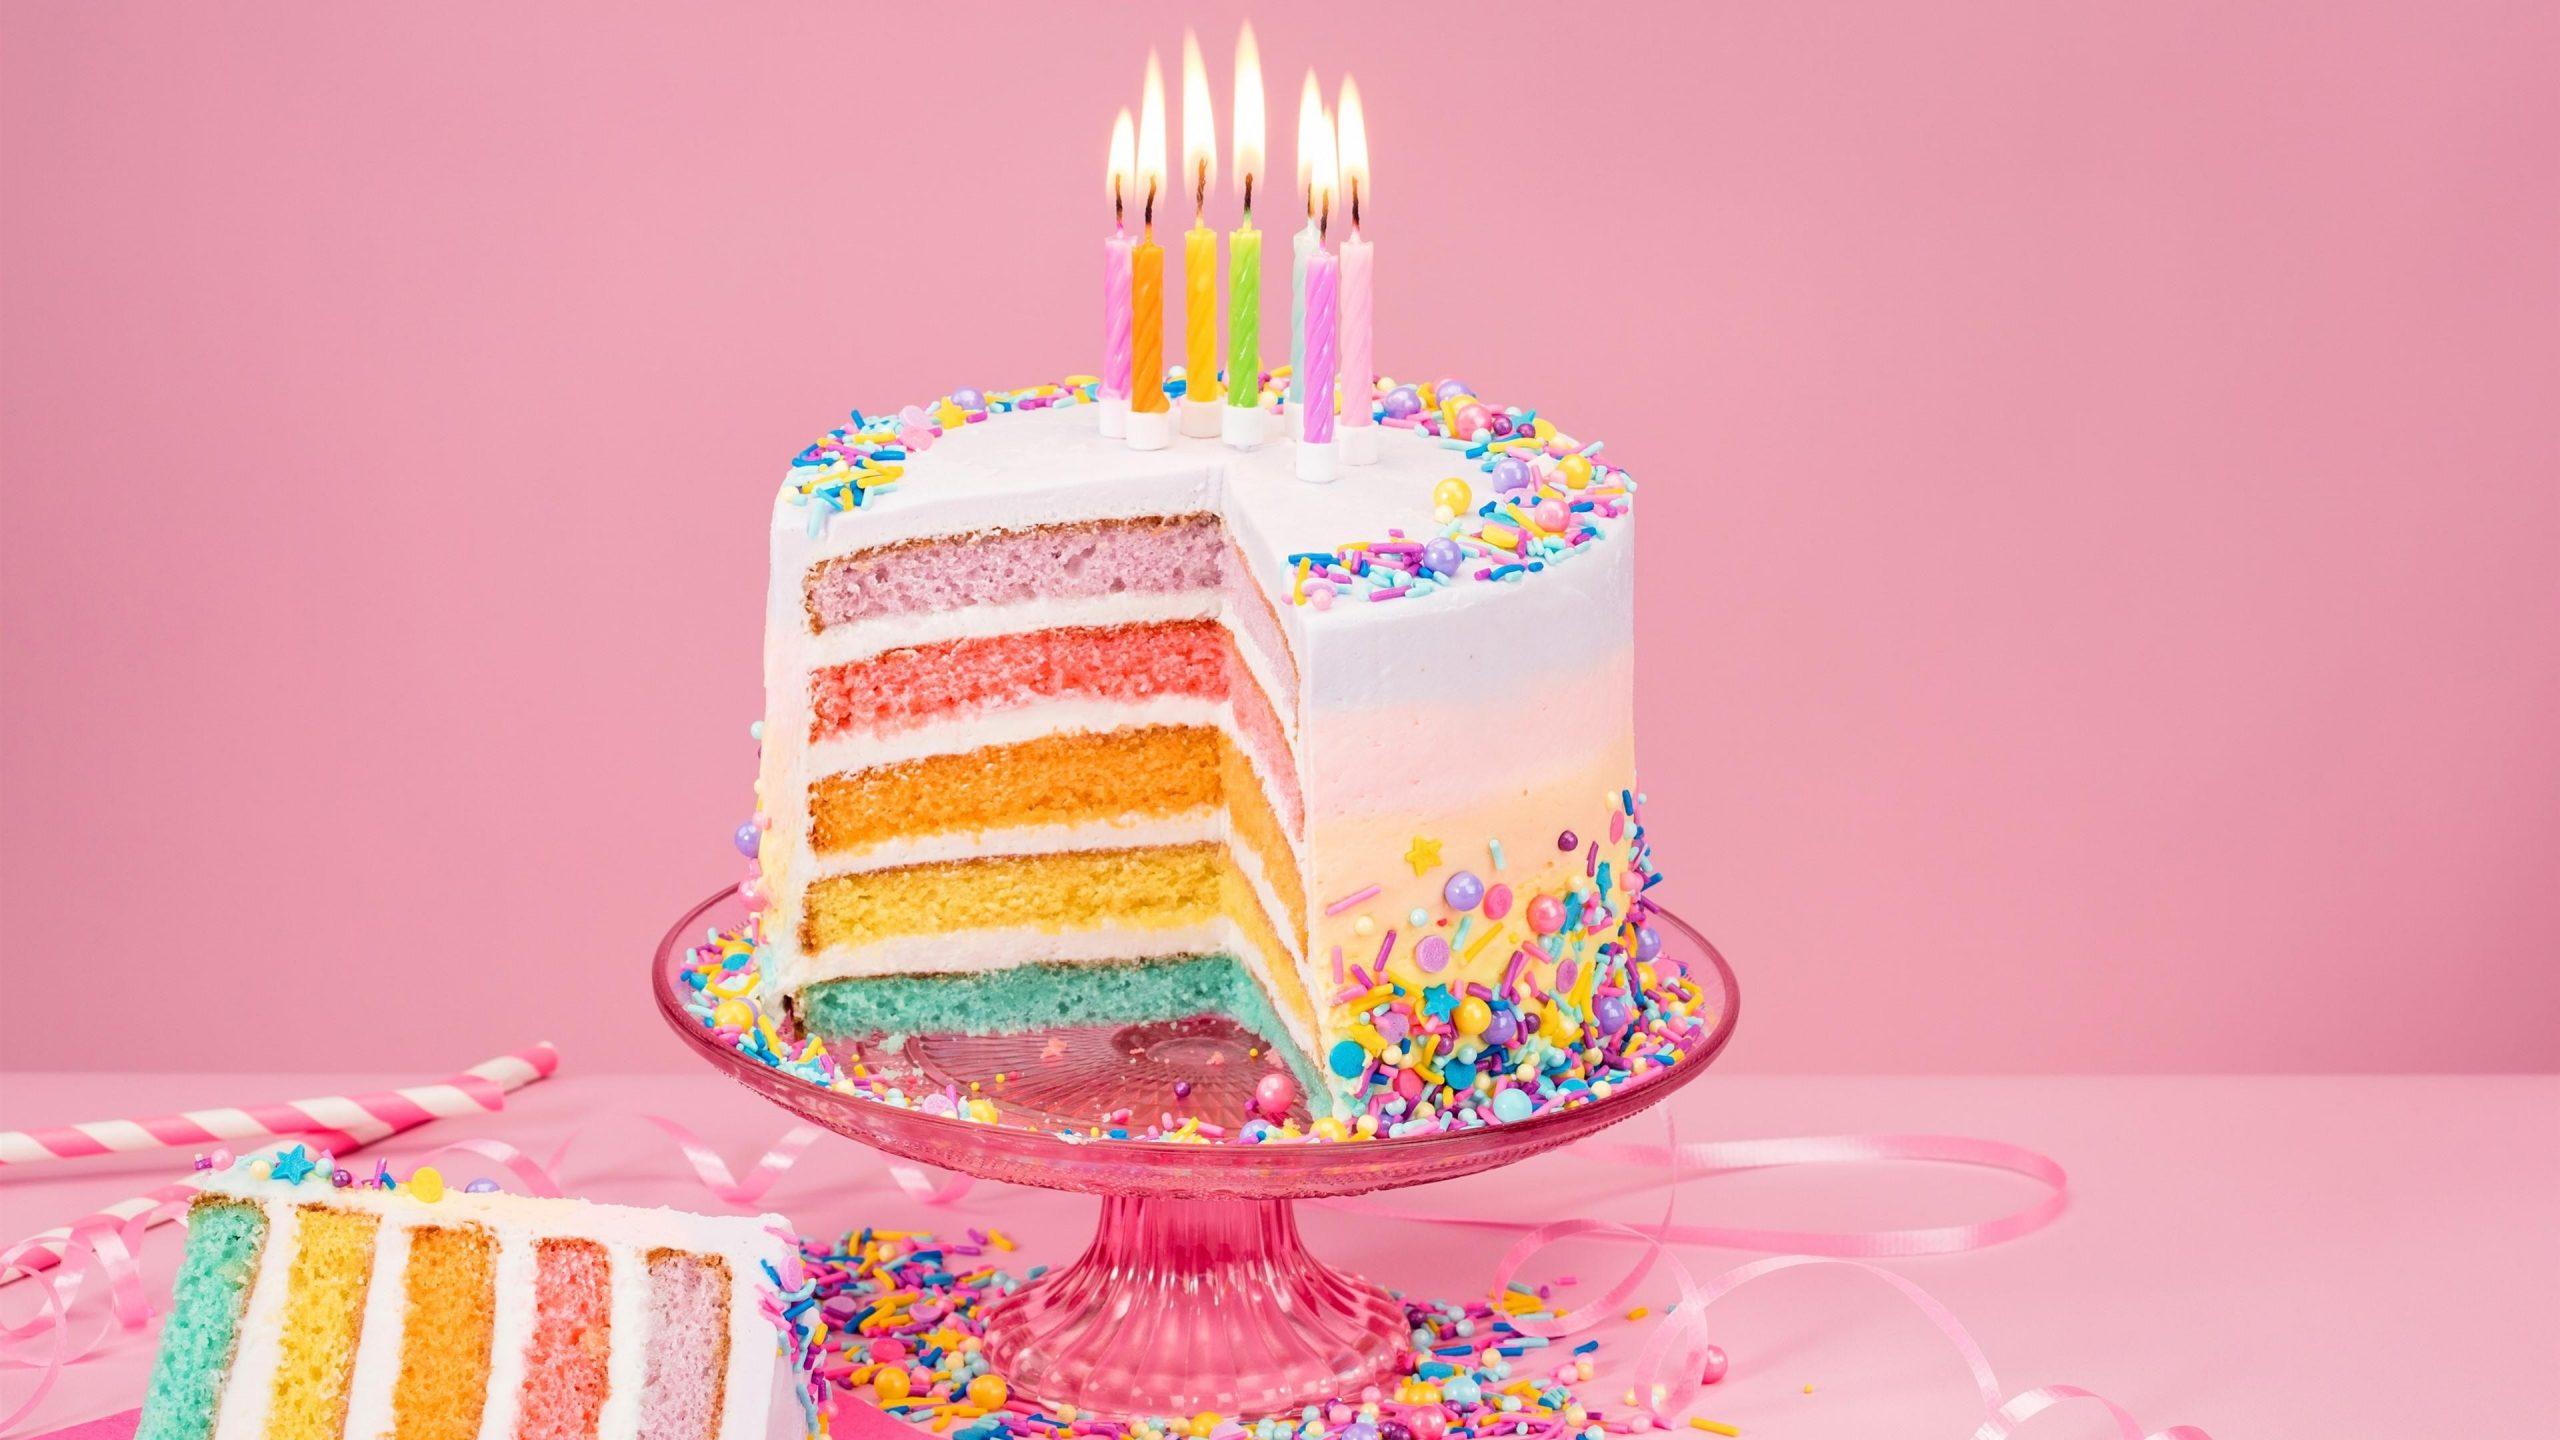 Birthday Cake wallpaper picture